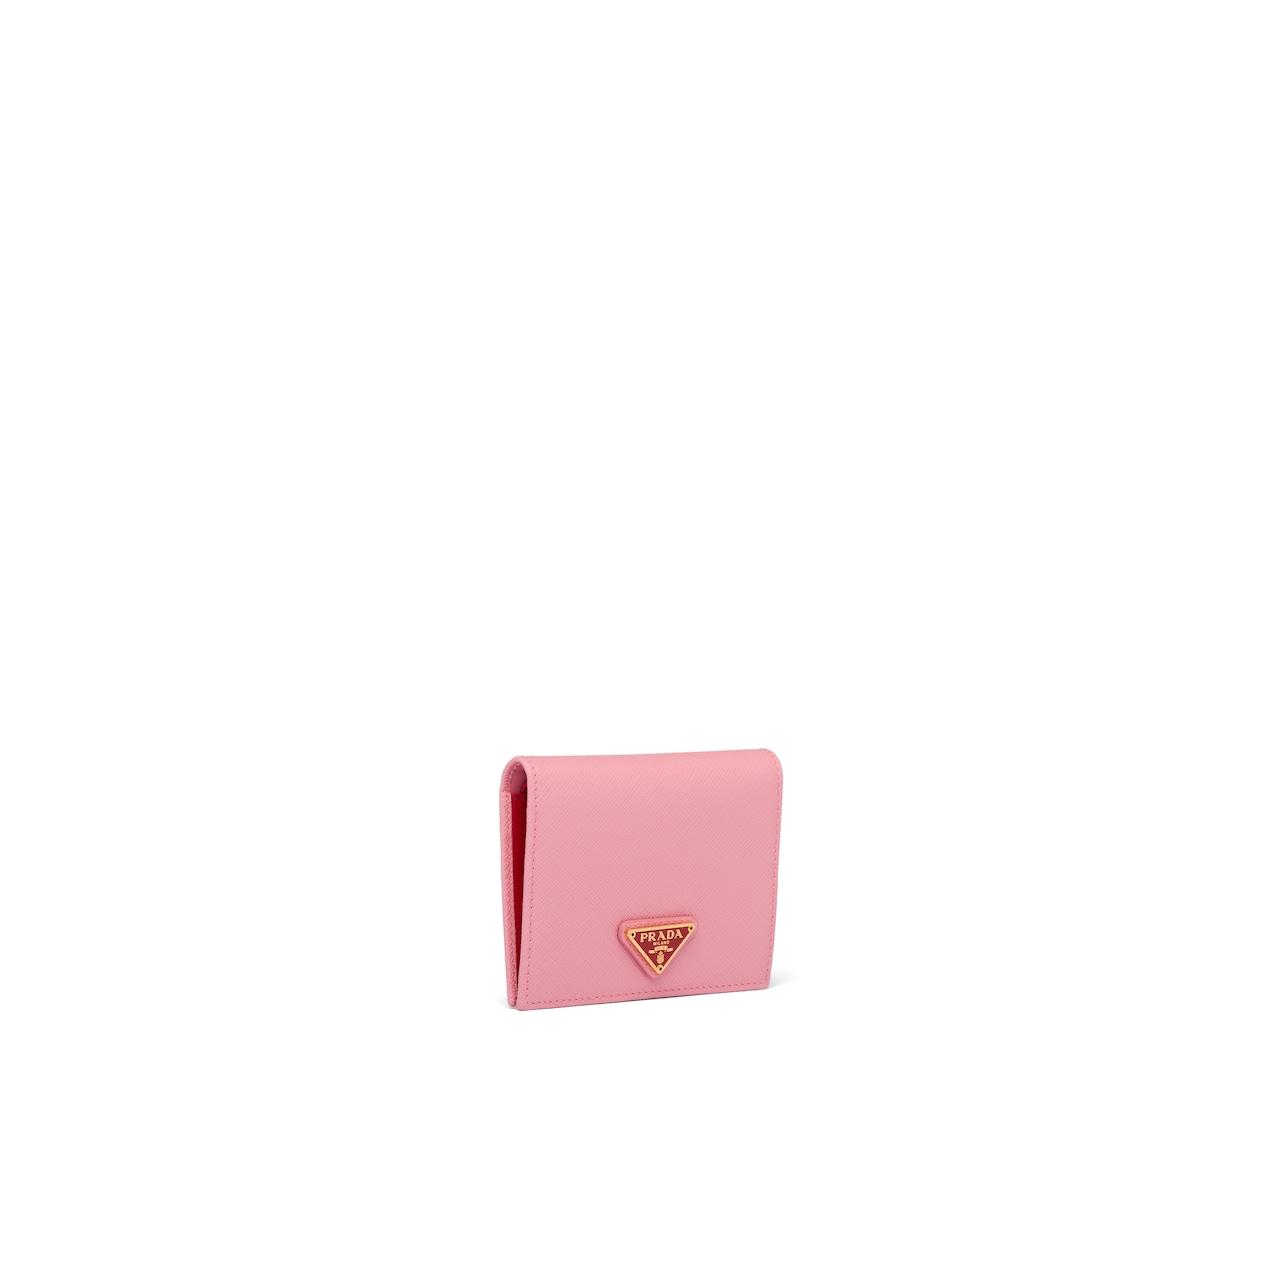 Prada Small Saffiano leather wallet 4